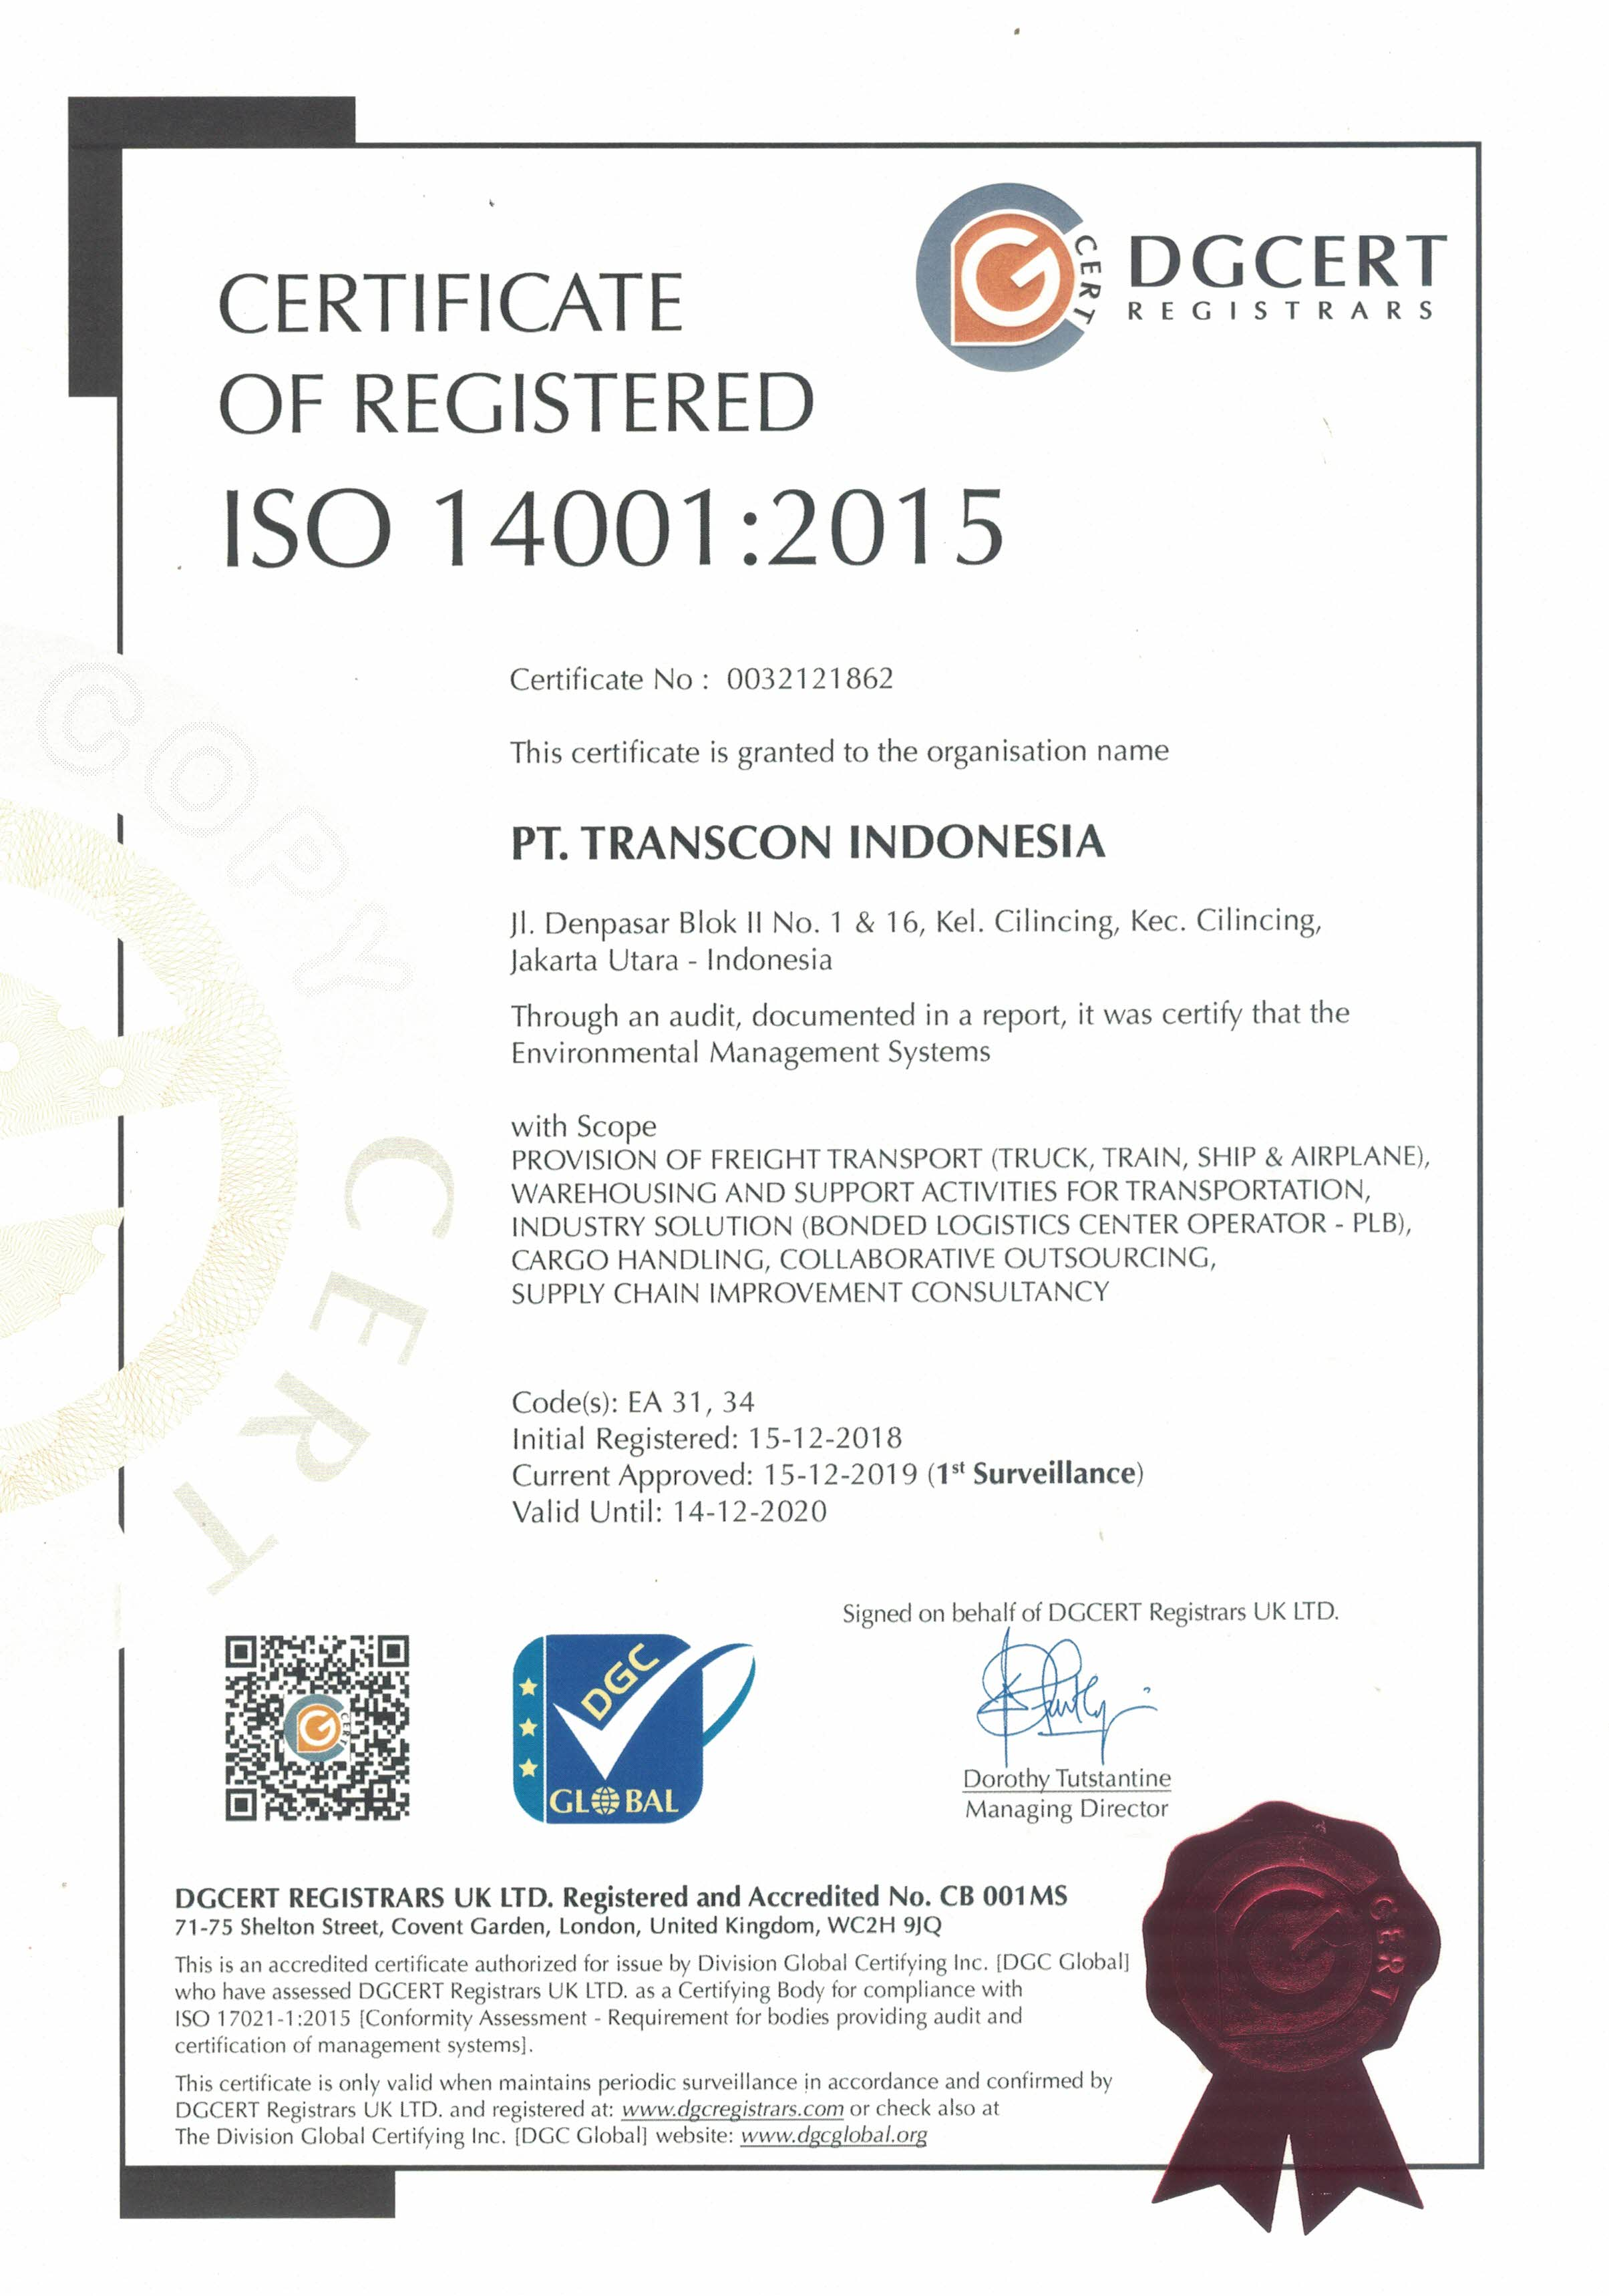 Sertifikasi ISO 14001:2015